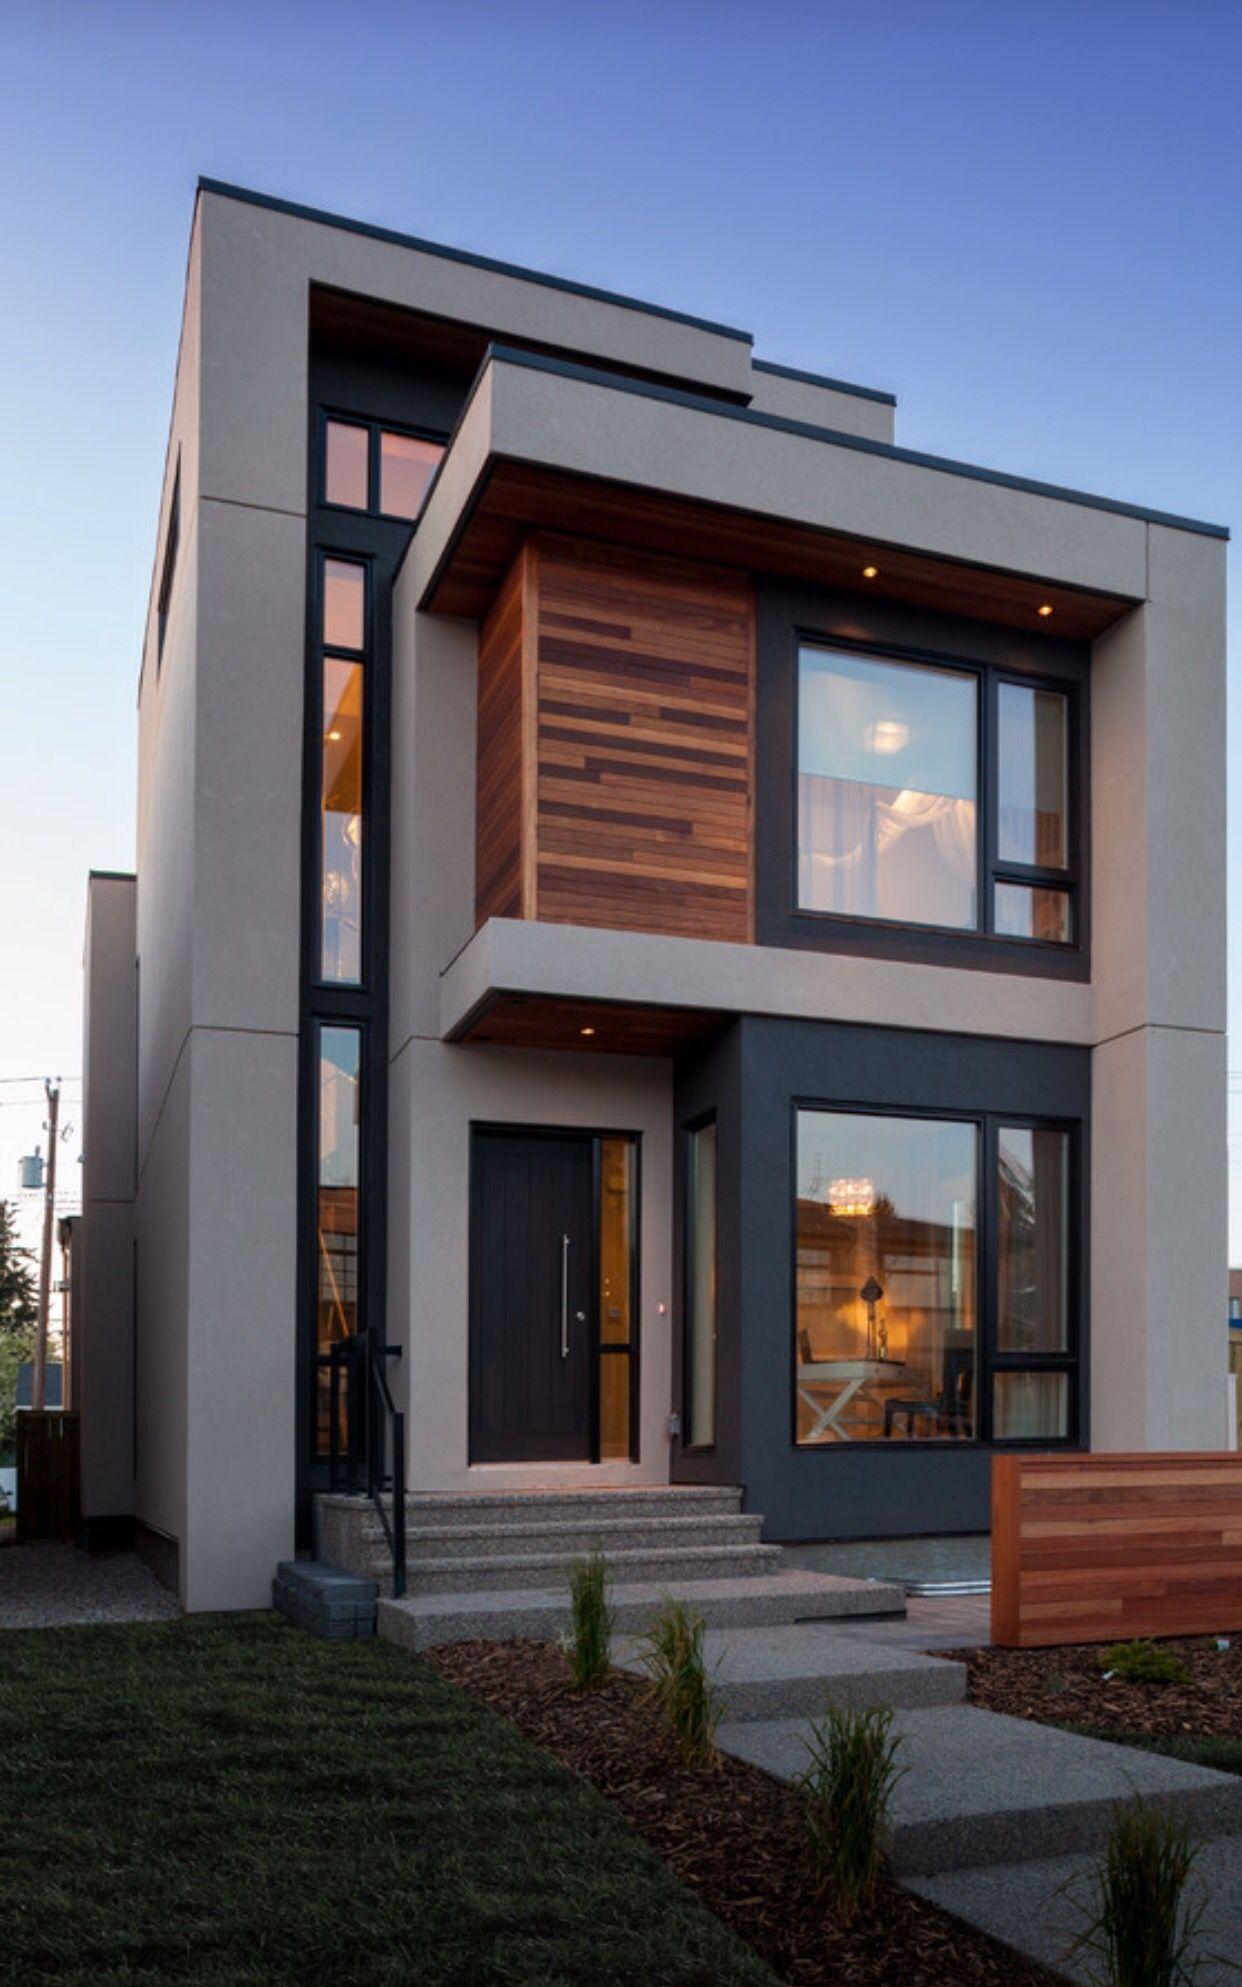 Midcentury | Curb Appeal | Pinterest | Moderne häuser, Architektur ...